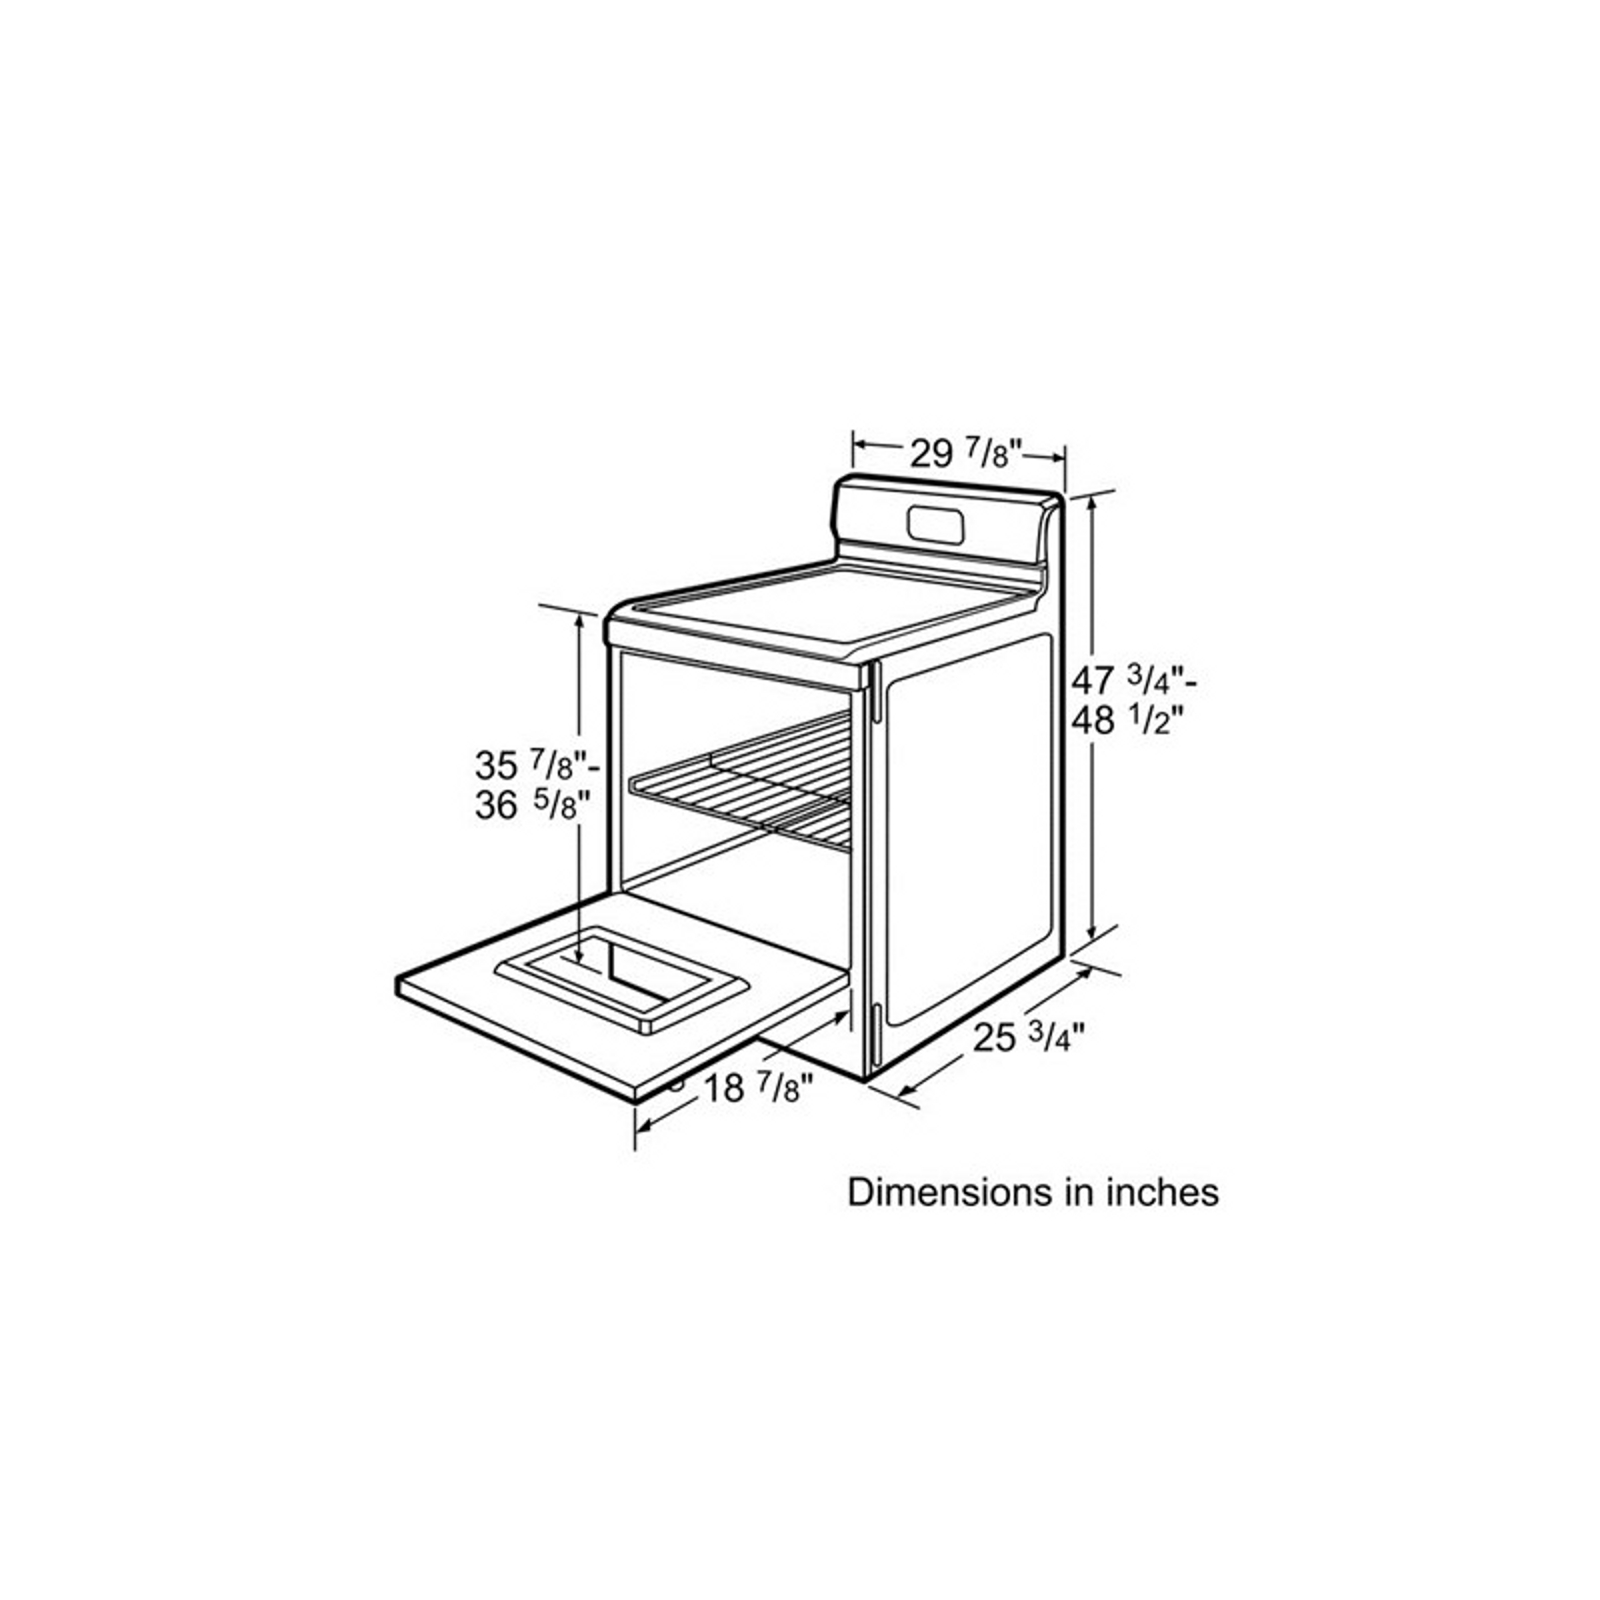 hight resolution of bosch 5 4 cu ft freestanding electric range sears craftsman riding mower wiring diagram bosch 5